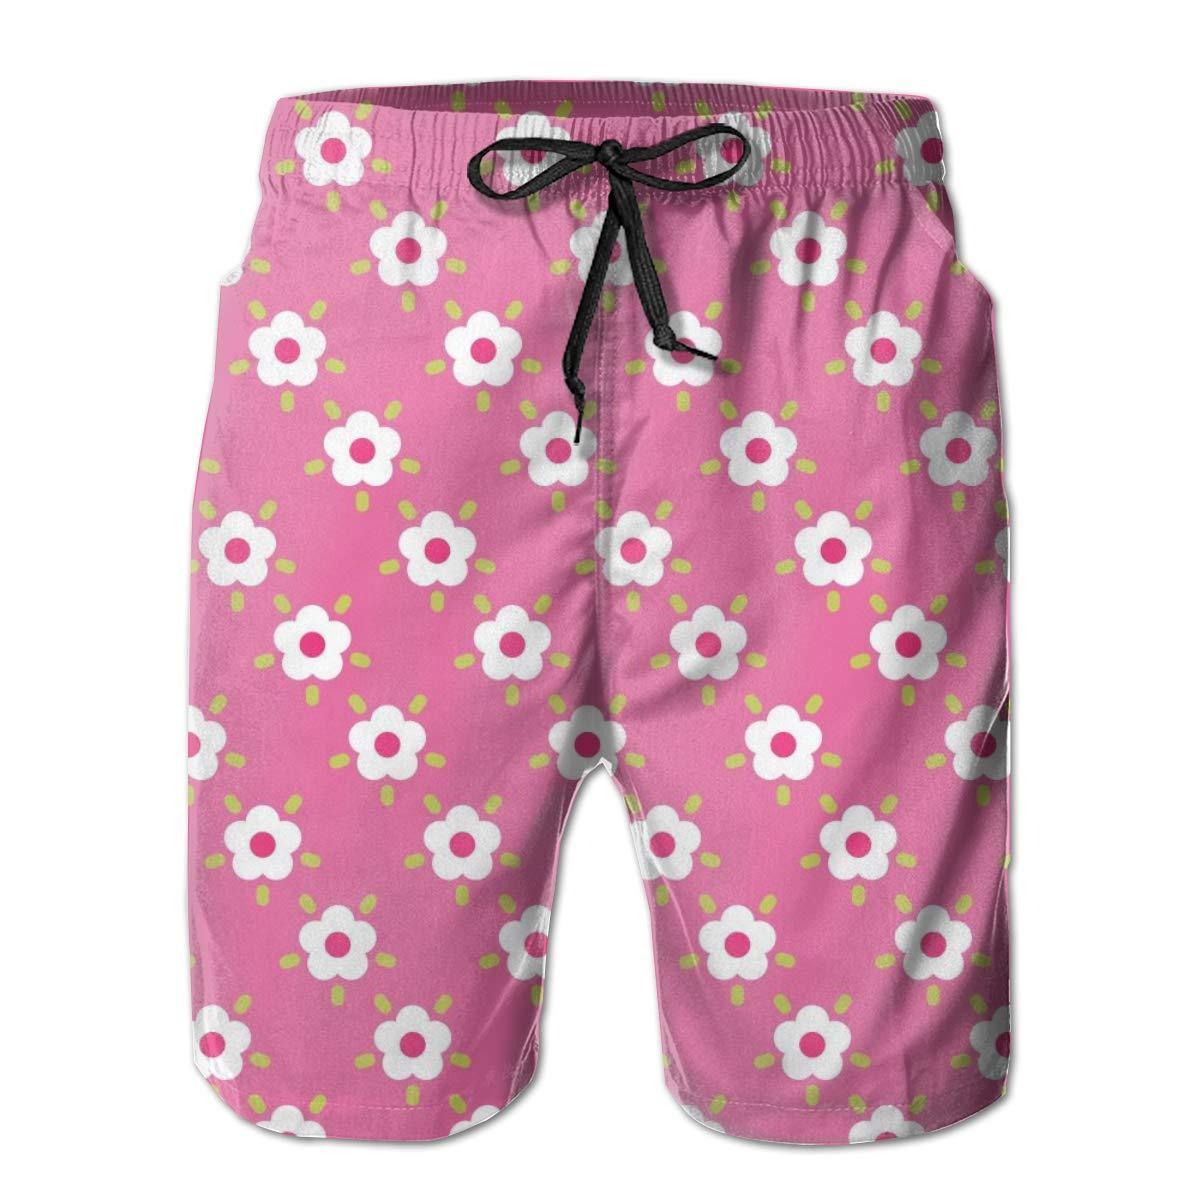 KIENGG Mens Swim Trunks with Mesh Lining Pockets White Pink Flowers Boys Polyester Board Shorts Swimwear